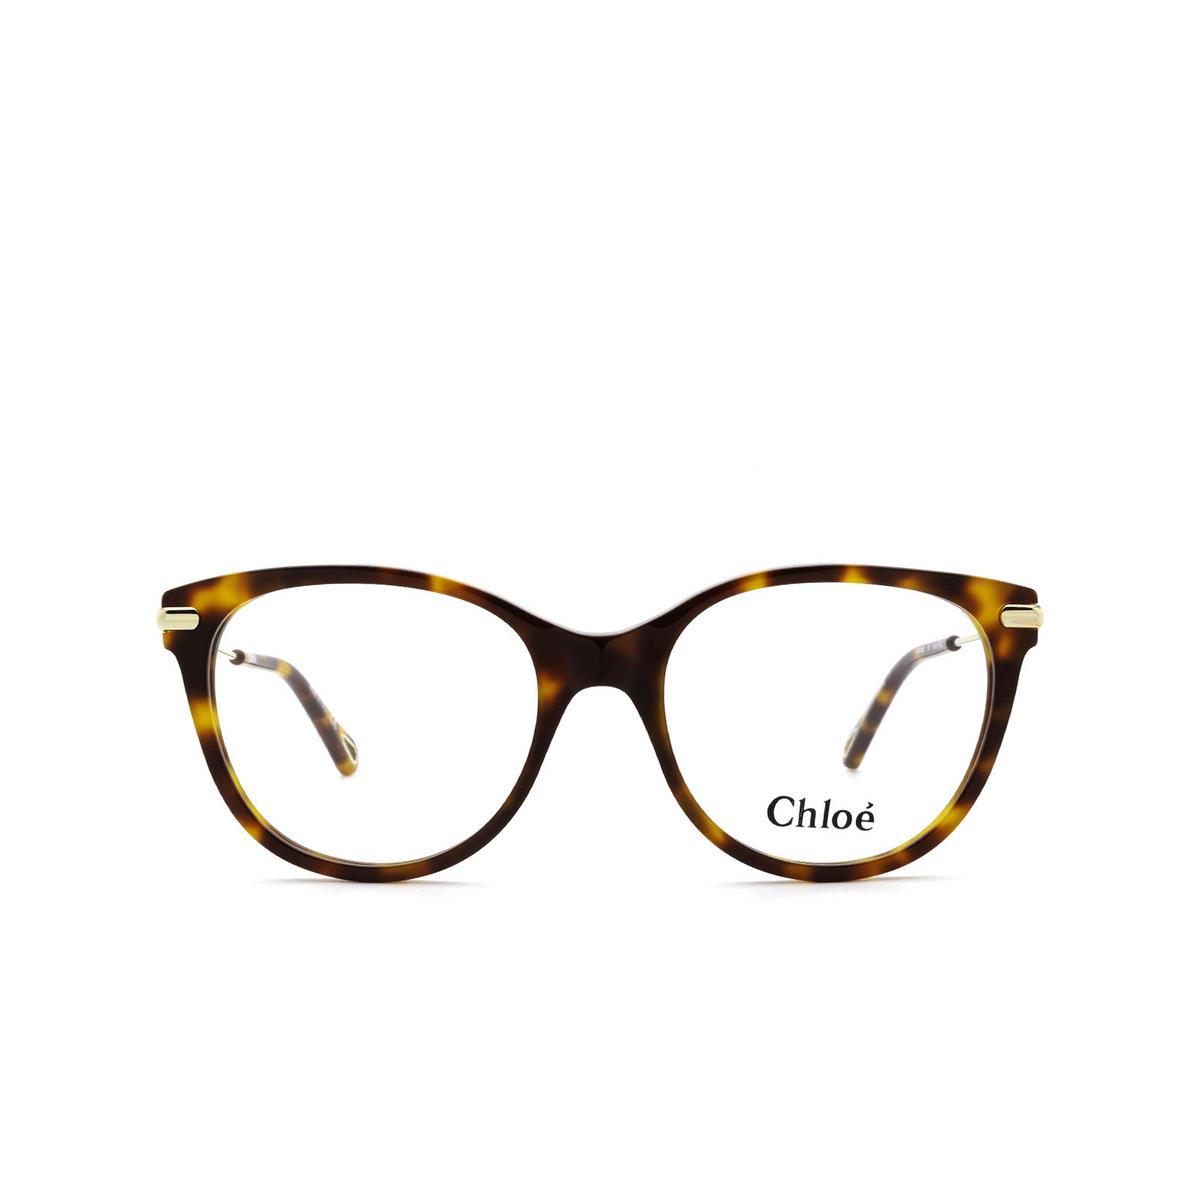 Chloé® Cat-eye Eyeglasses: CH0058O color Havana 001 - front view.